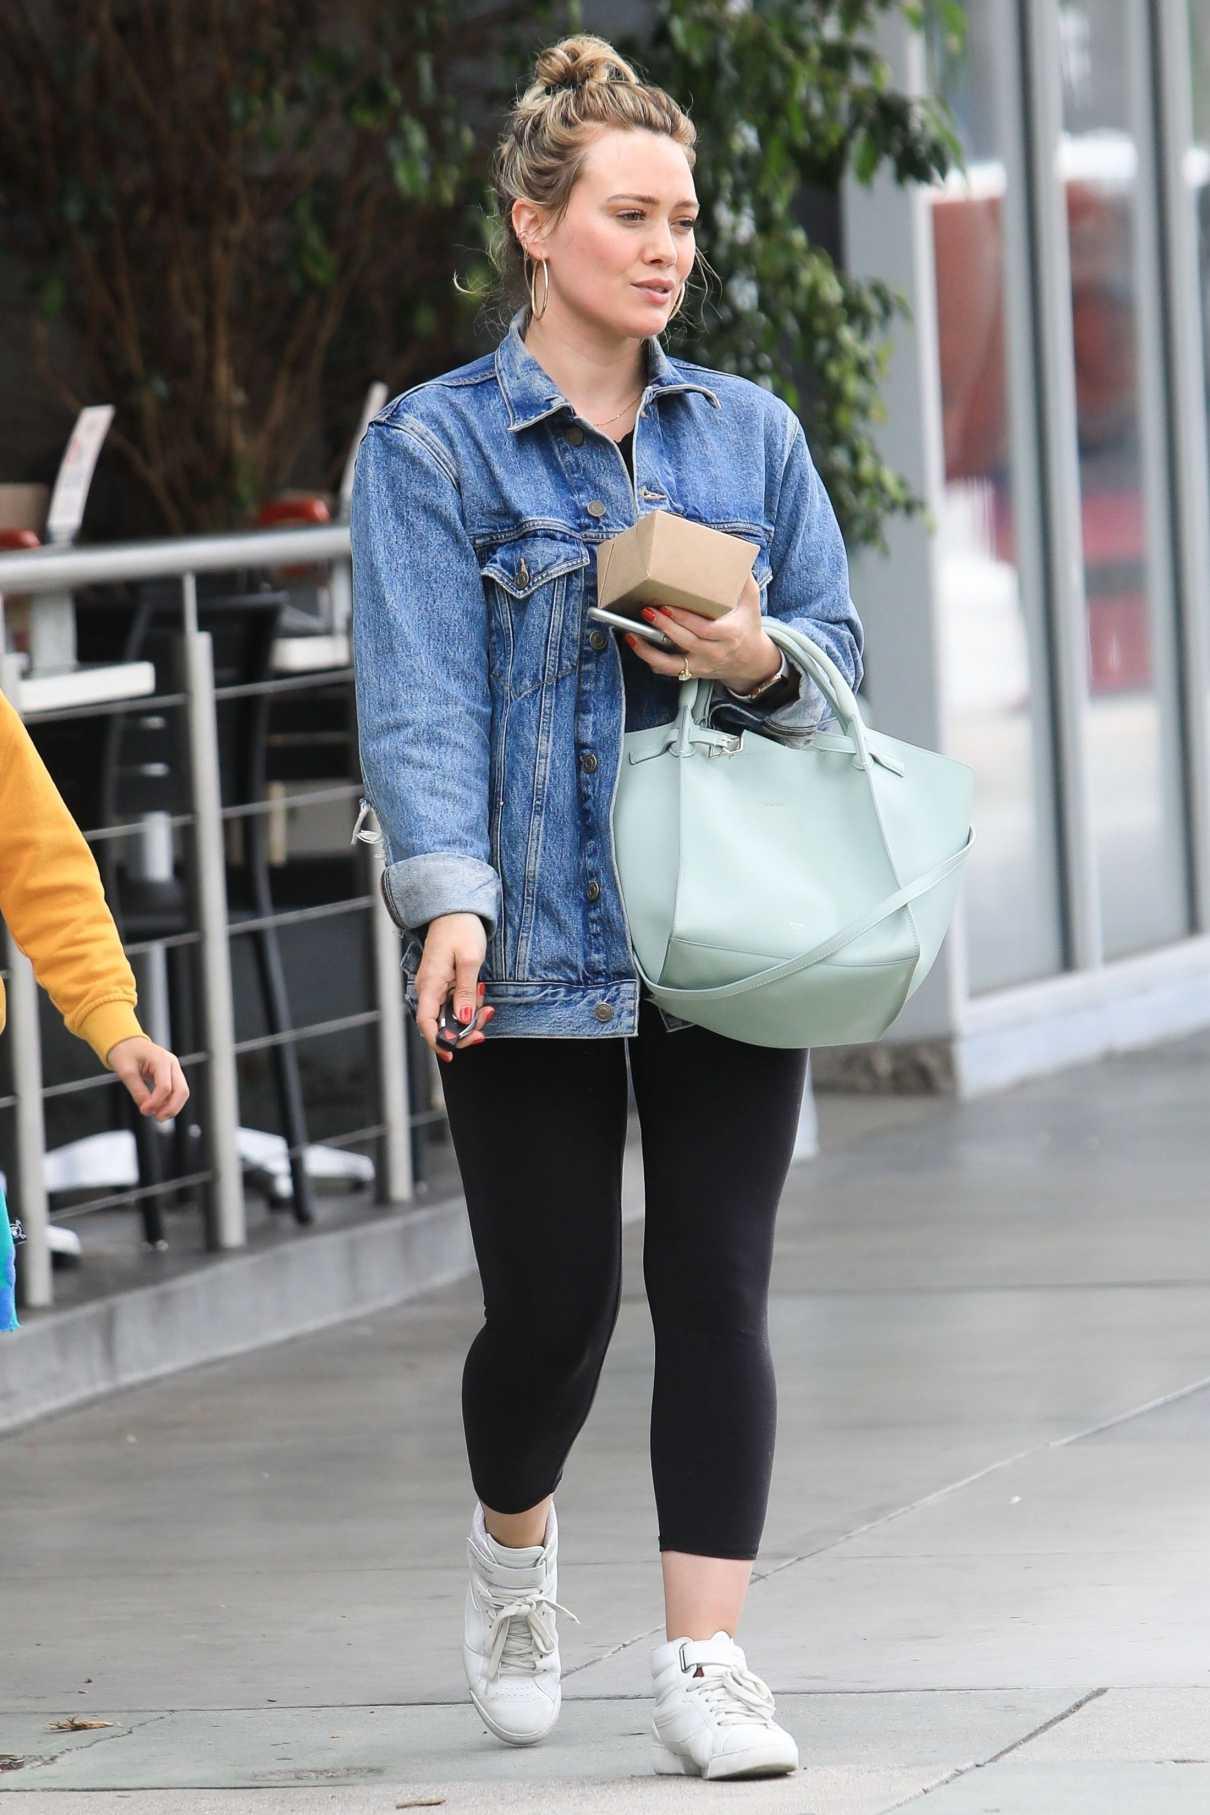 Hilary Duff in a Blue Denim Jacket